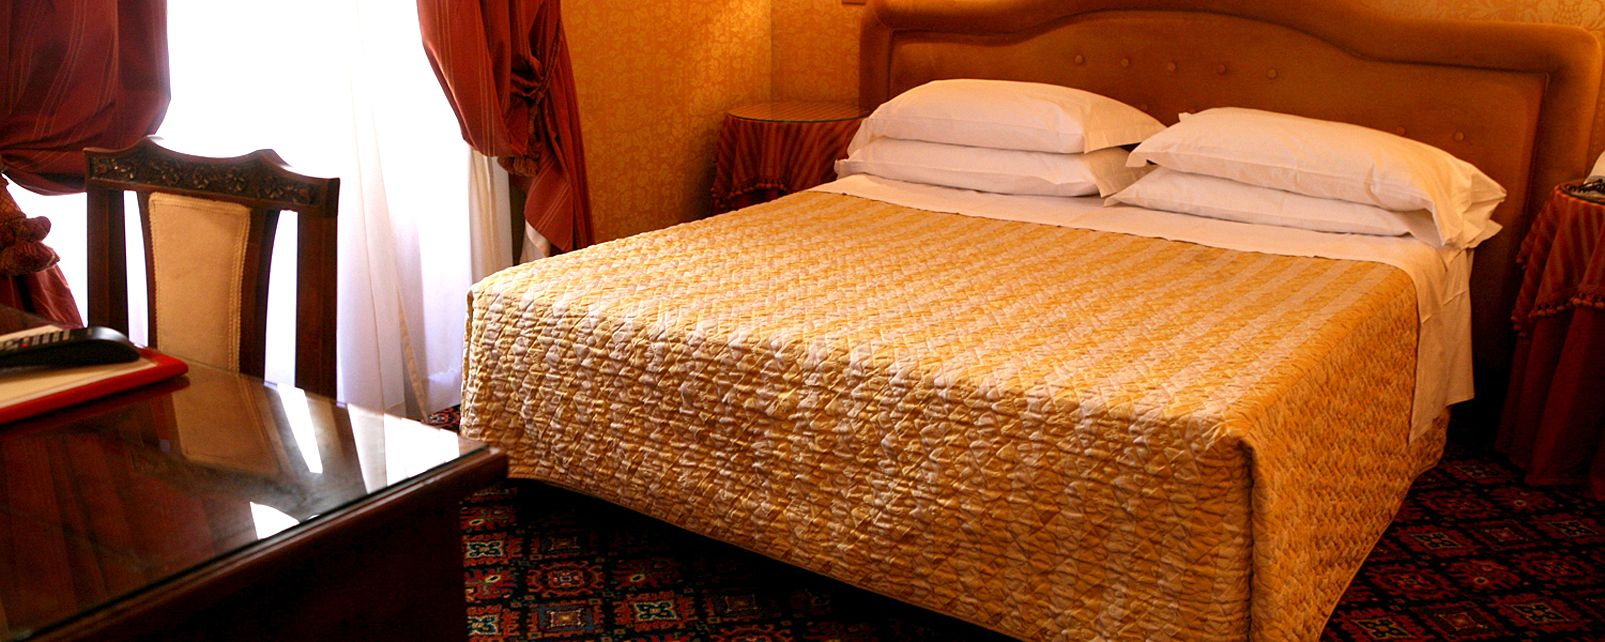 Hotel Morgana Hotel